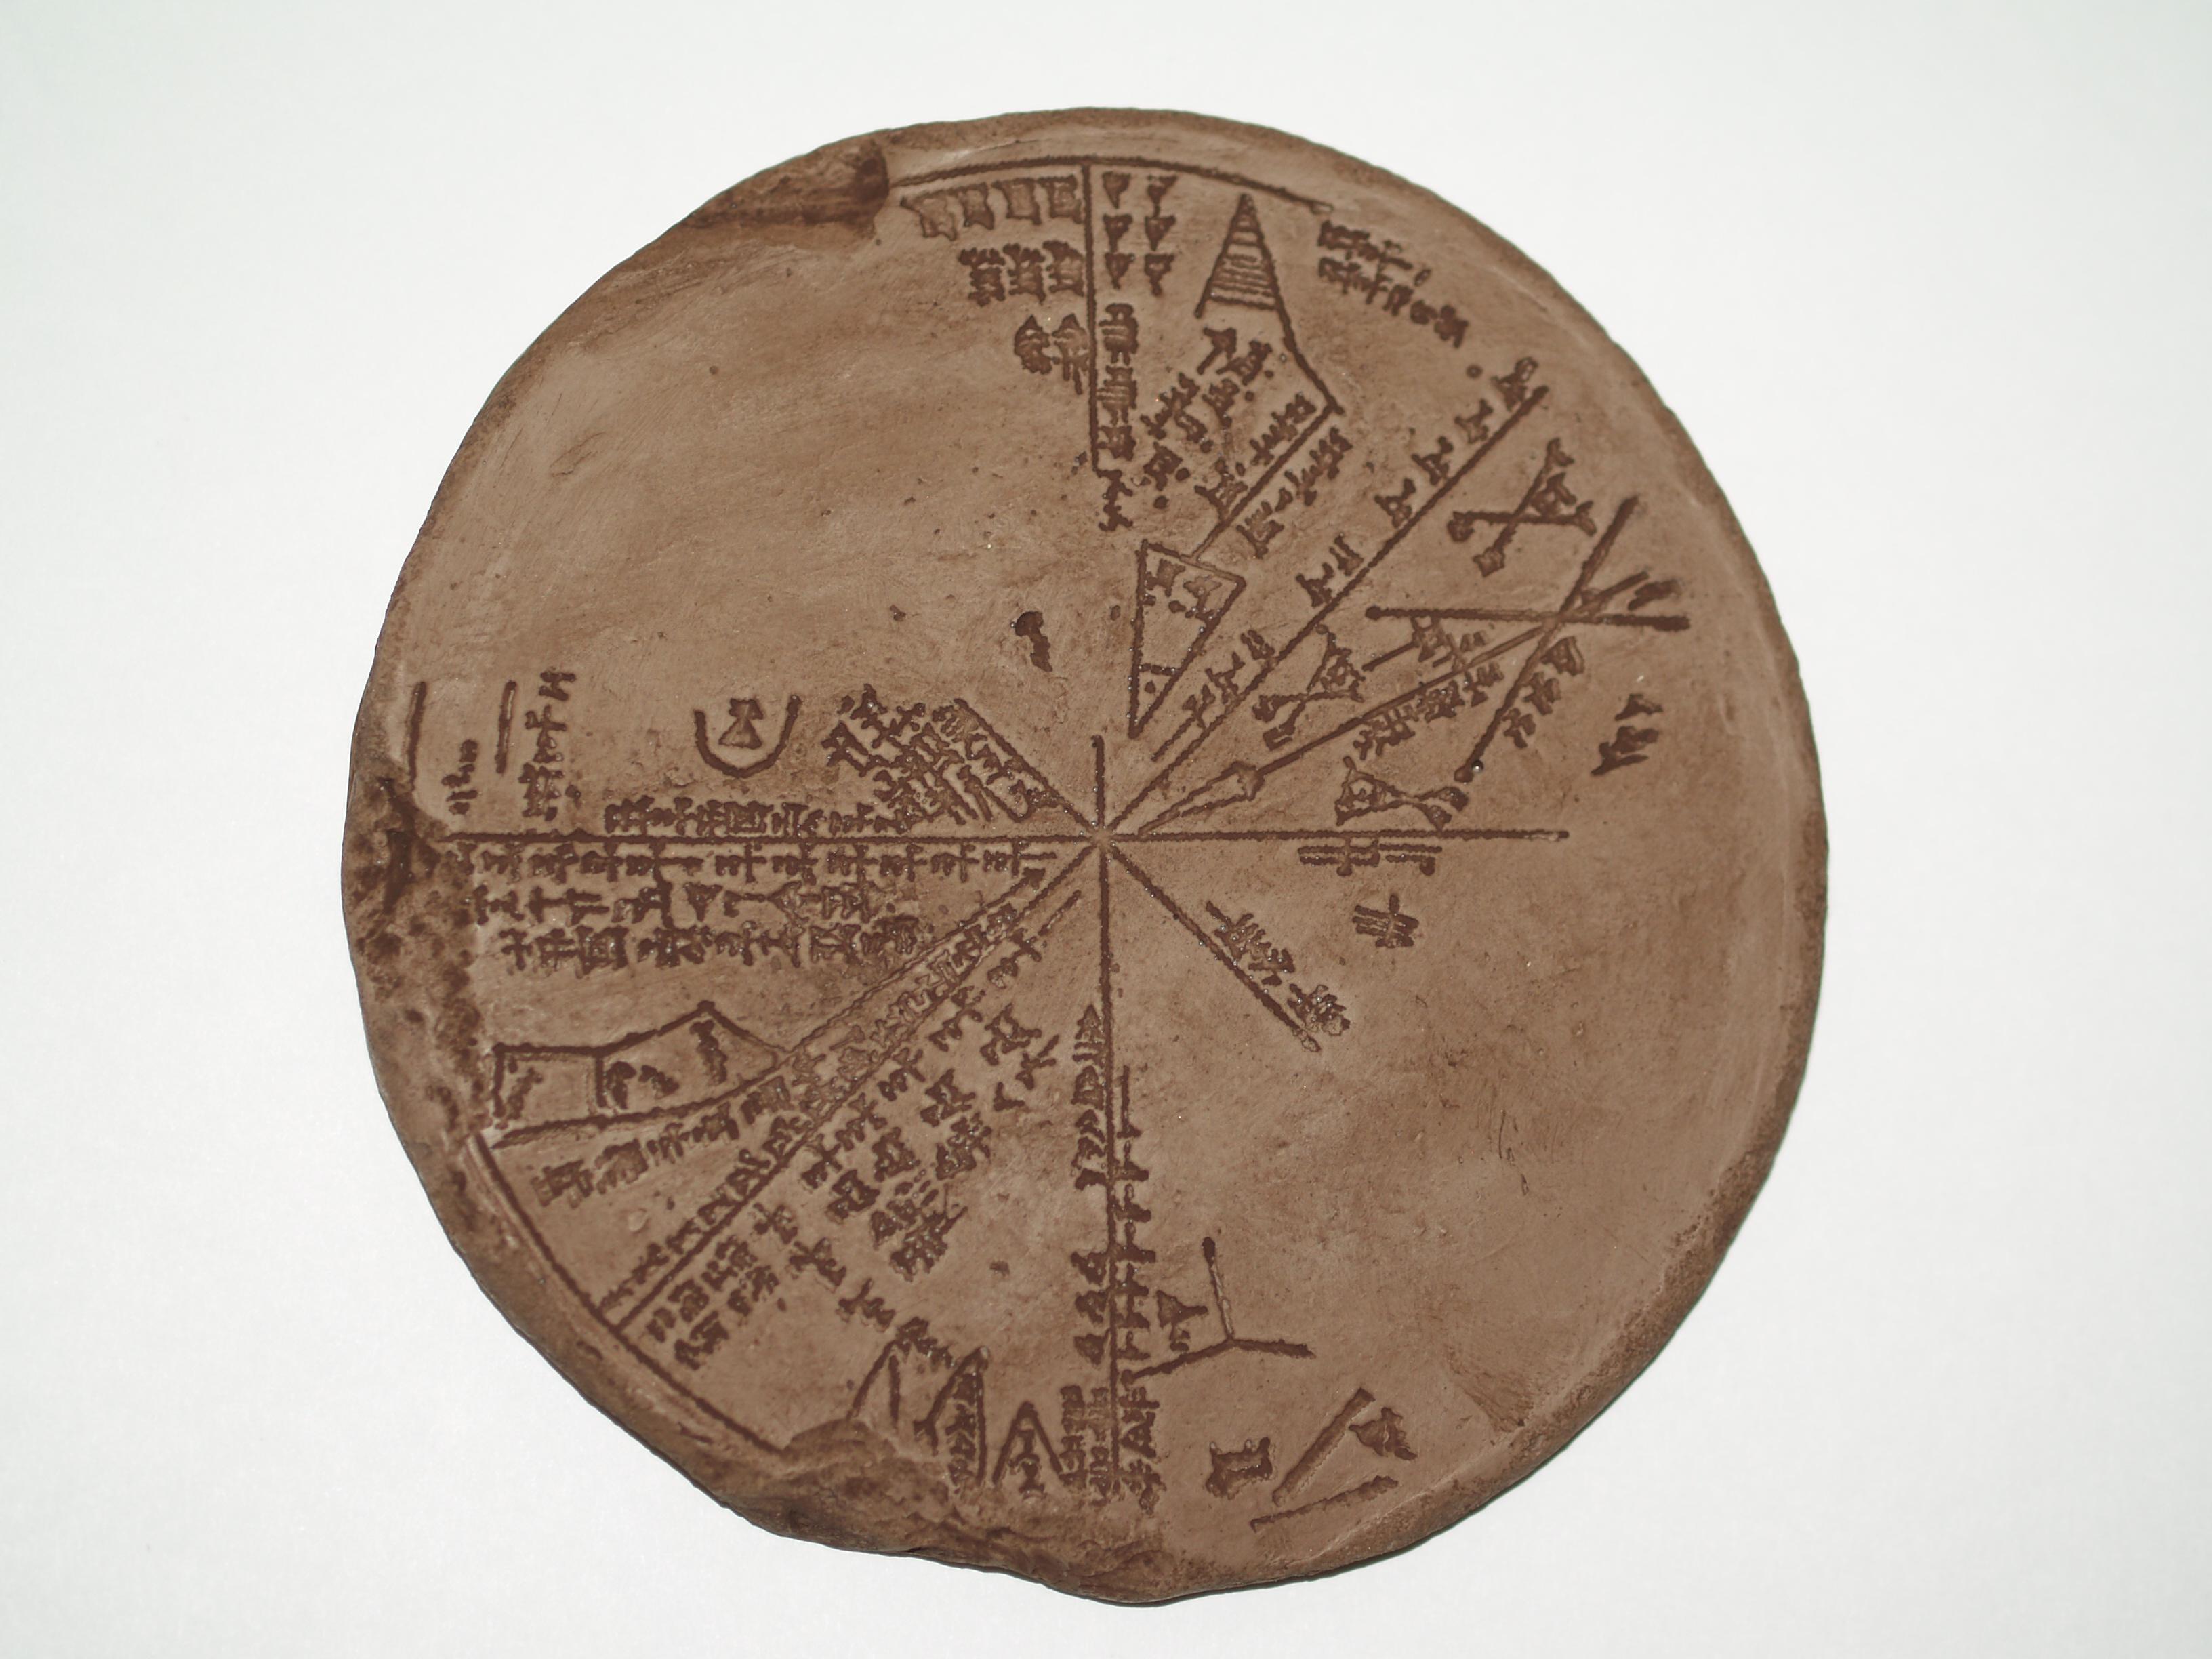 Sumerian Star Map Or Plaisphere Ca 650 Bc Computer Analysis Has